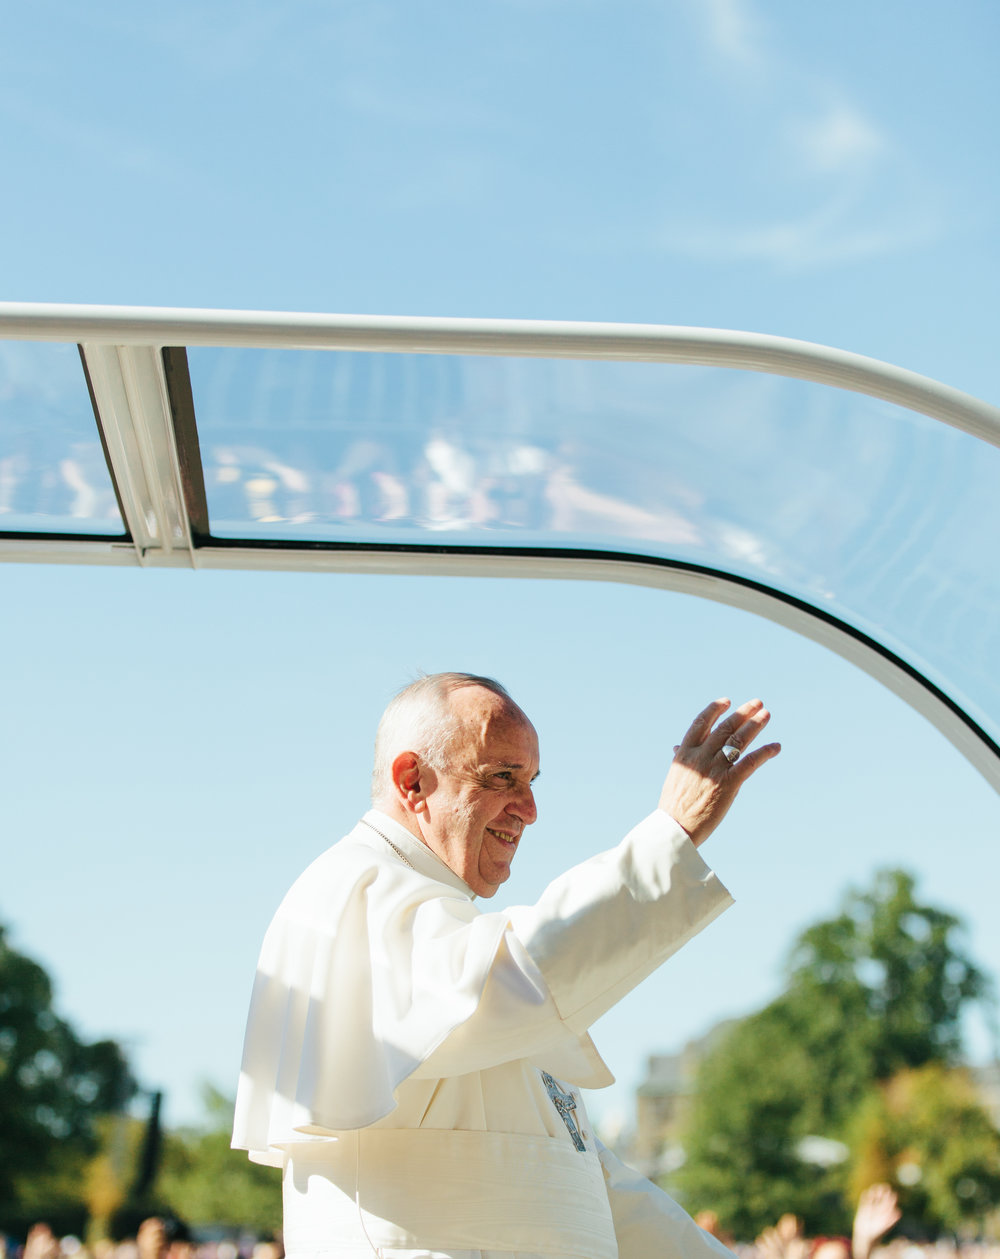 Pope+Francis+in+Washington+DC+by+Branden+Harvey.jpeg